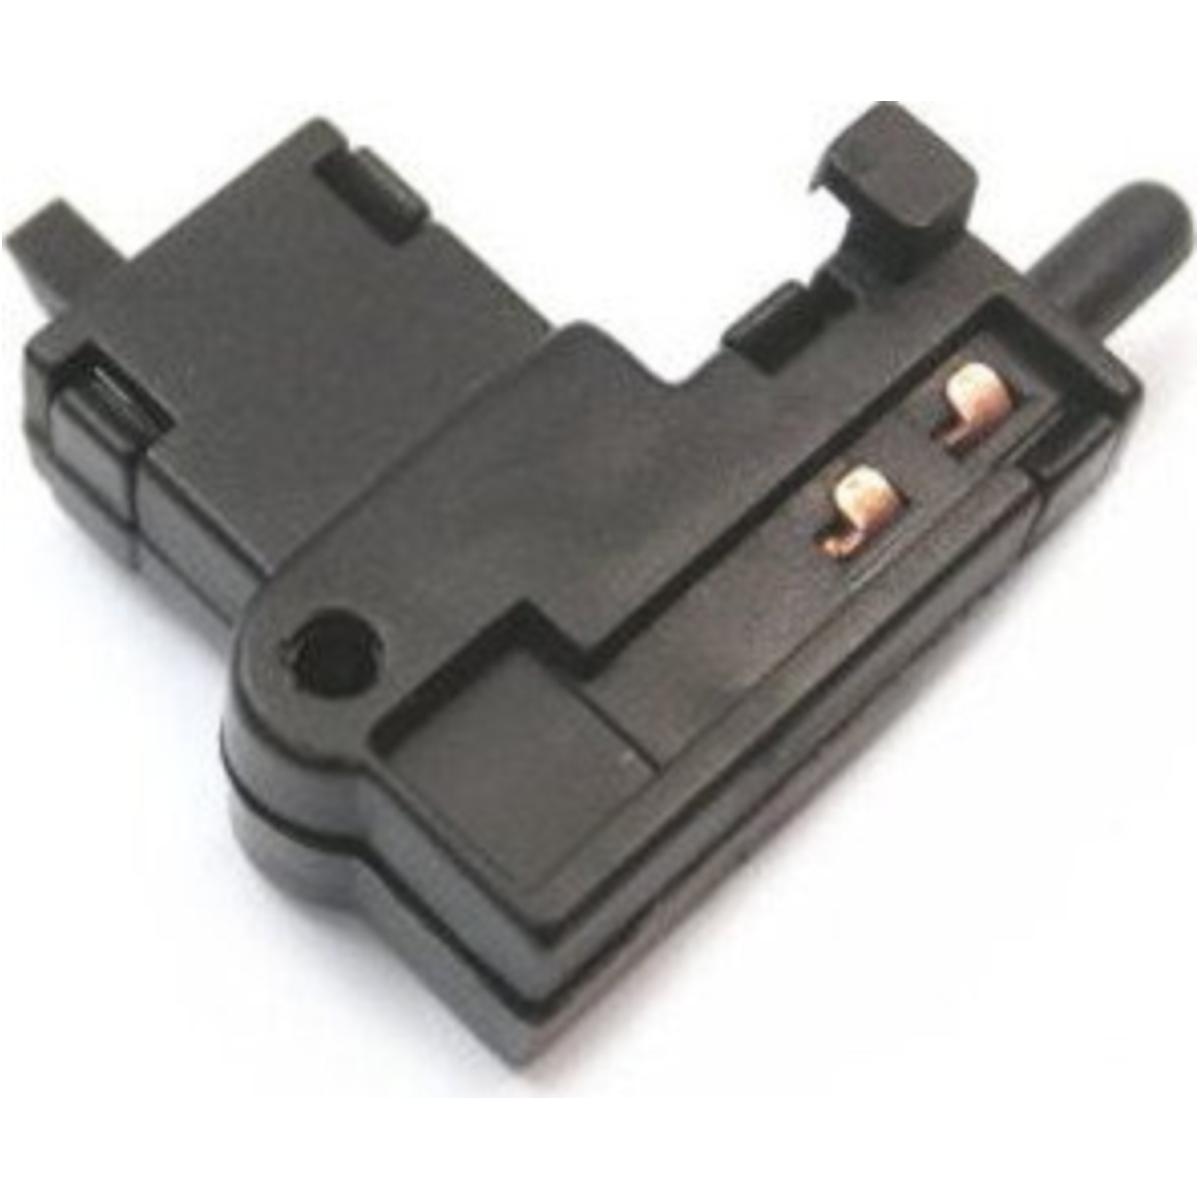 Clutch cut out switch jmp BD220081 für Yamaha MT-07 ABS 700 RM042 2014,  74,8 PS, 55 kw